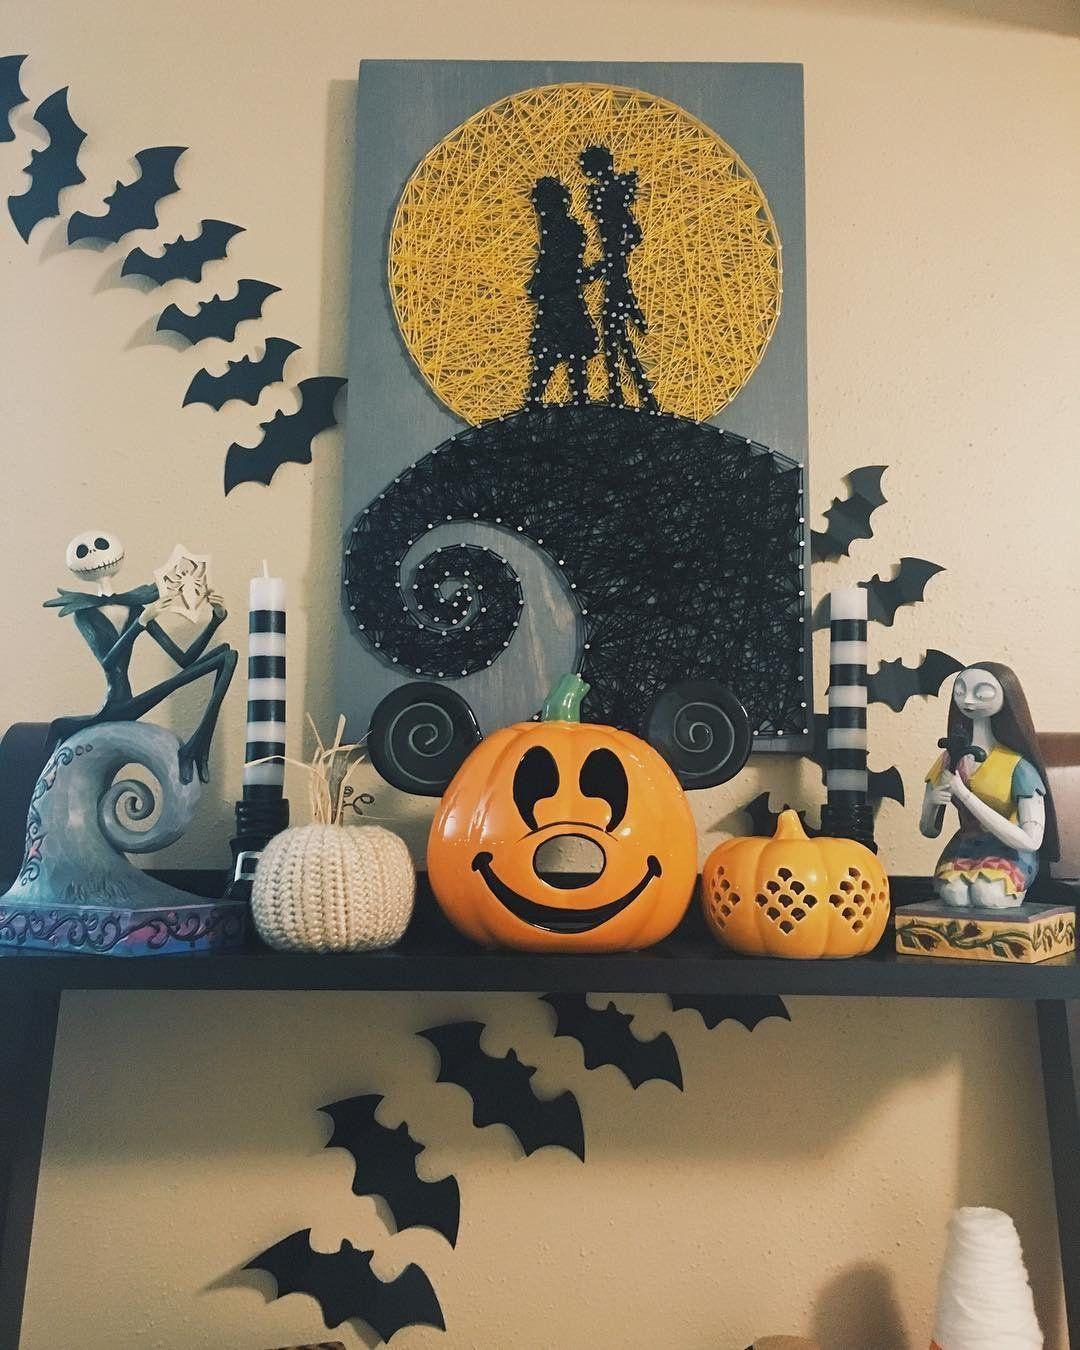 Halloween Disney Decorating Ideas Popsugar Home Disney Decor Disney Halloween Decorations Halloween Home Decor